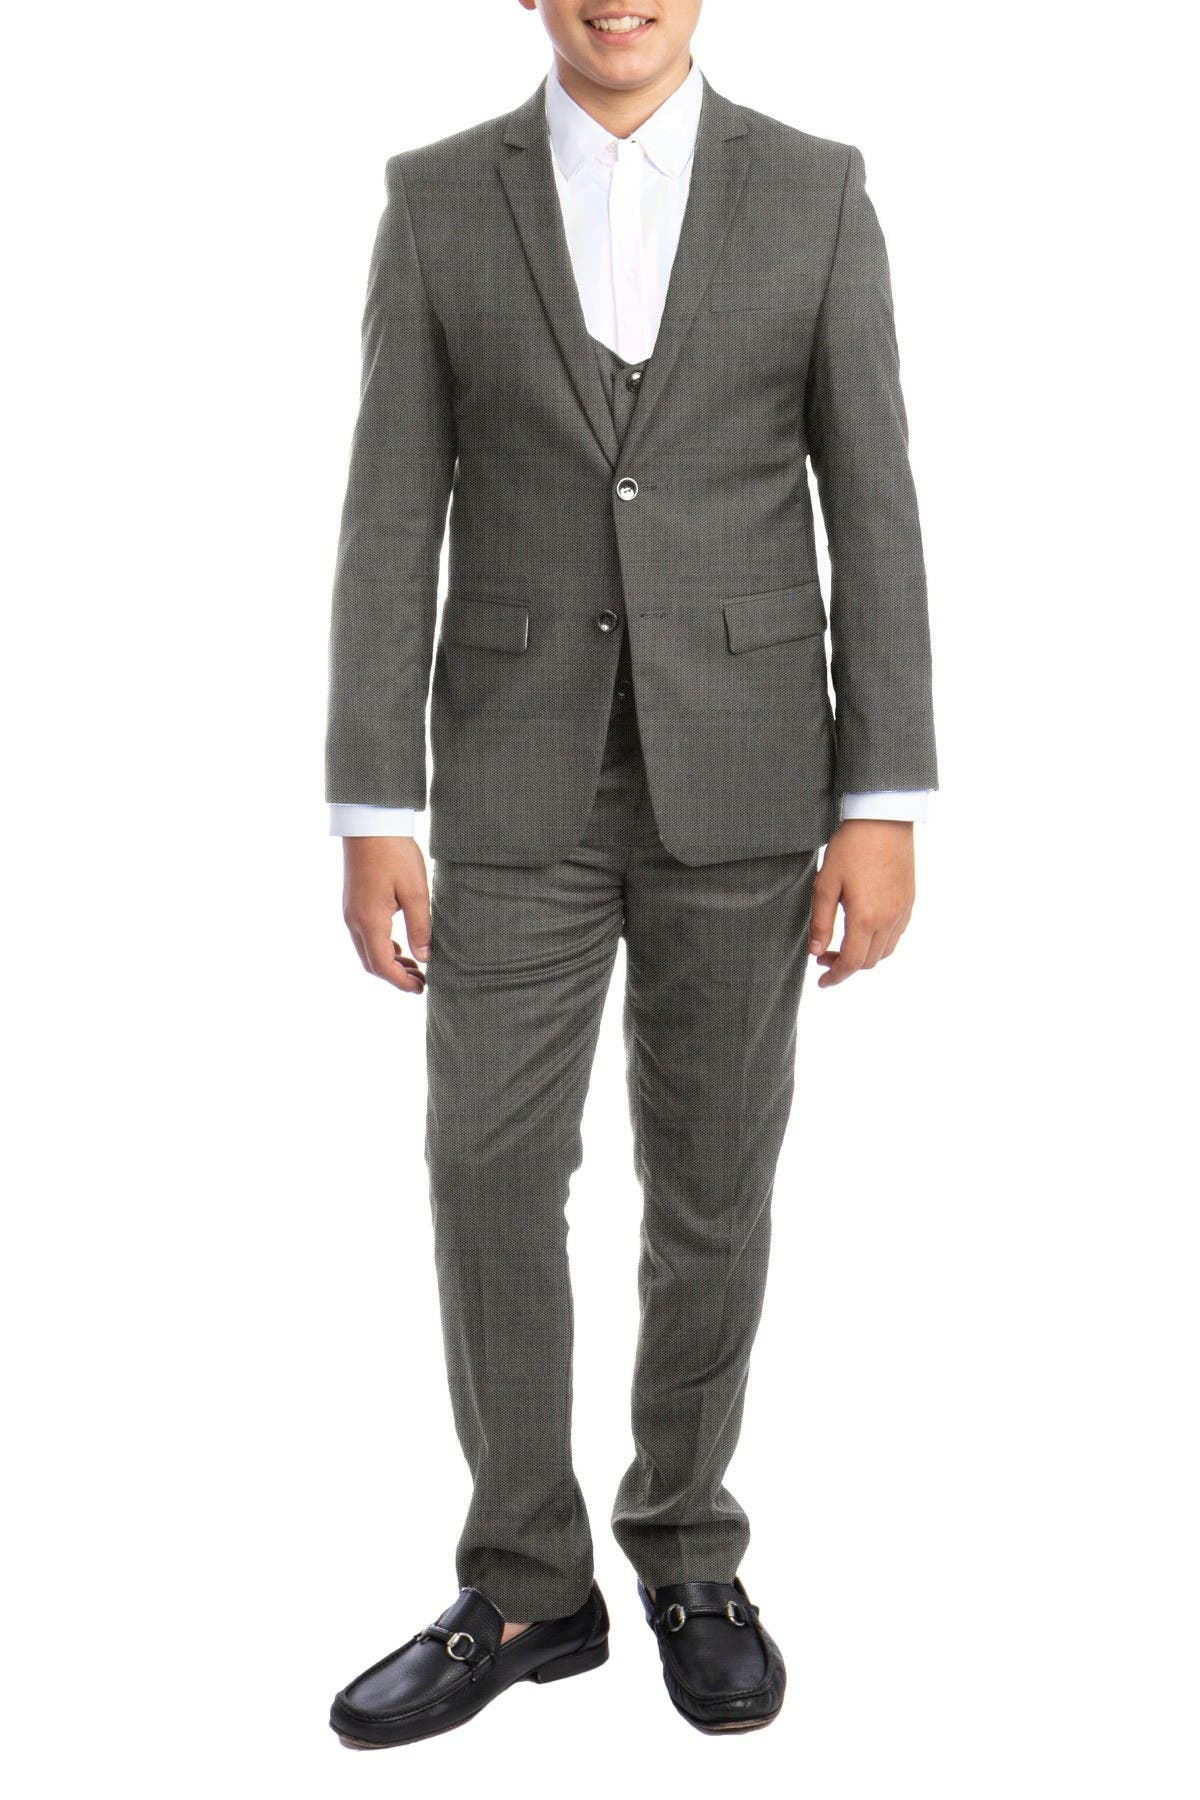 Image of Perry Ellis Portfolio Light Grey Sharkskin 3-Piece Suit Set